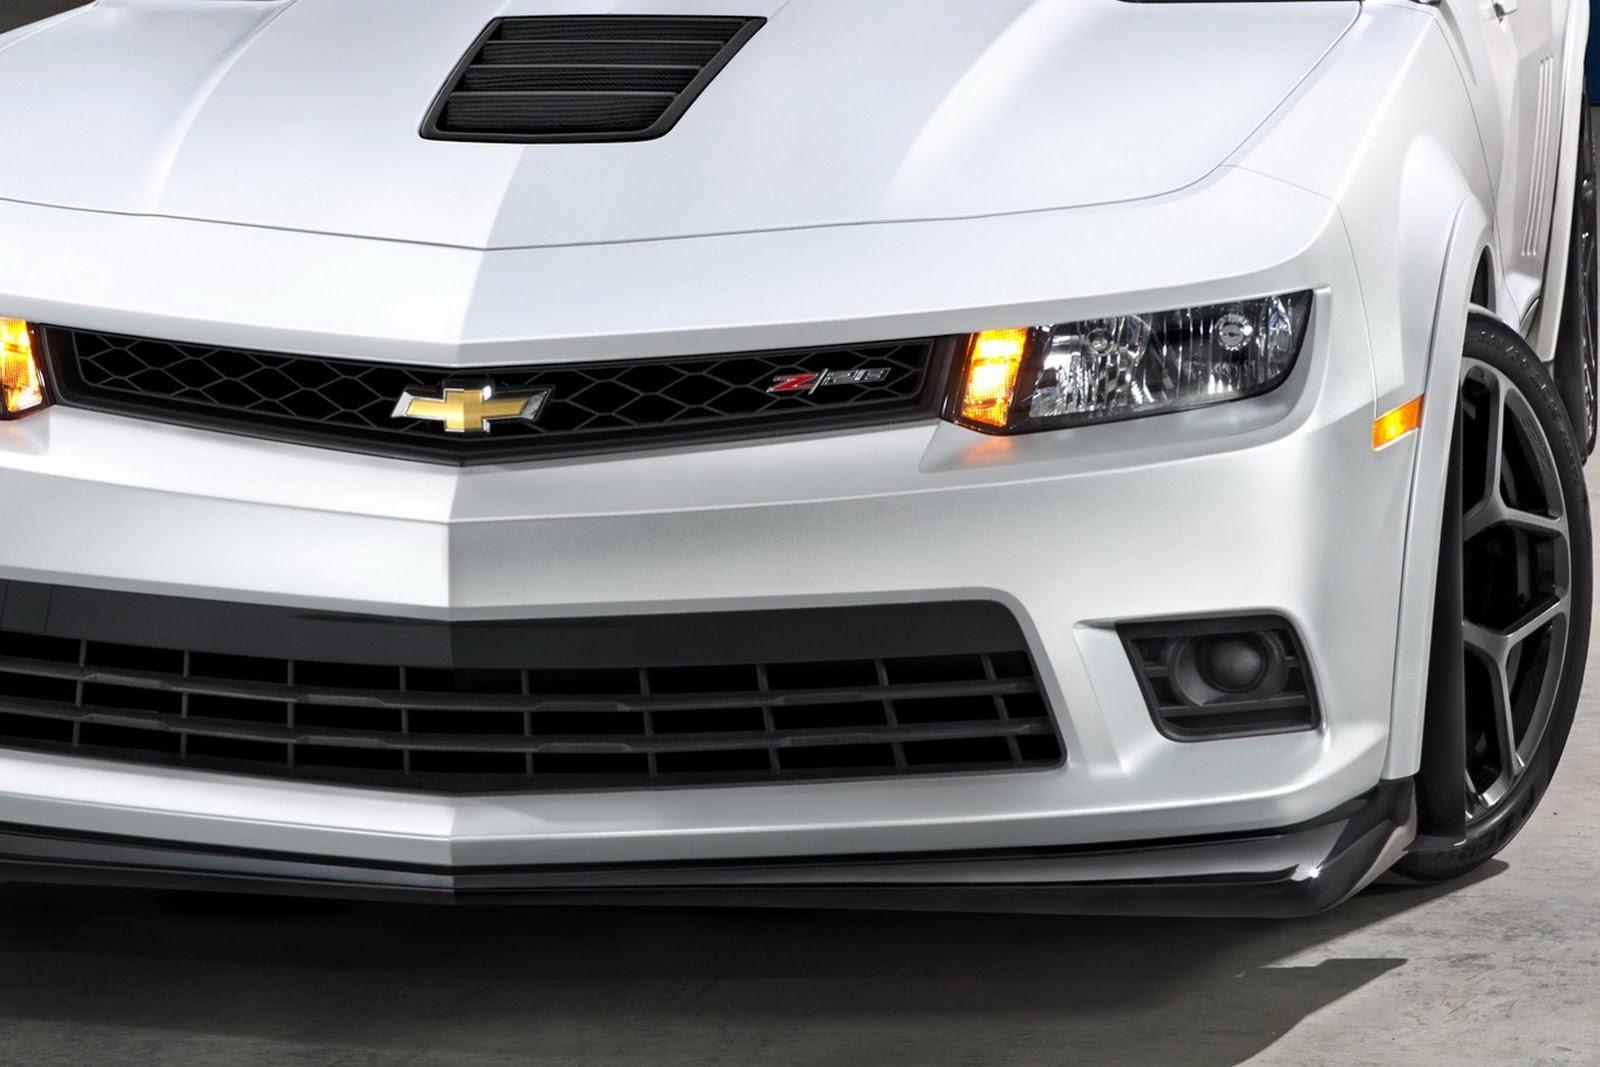 2014 Camaro Lt1 Release Date | Autos Post